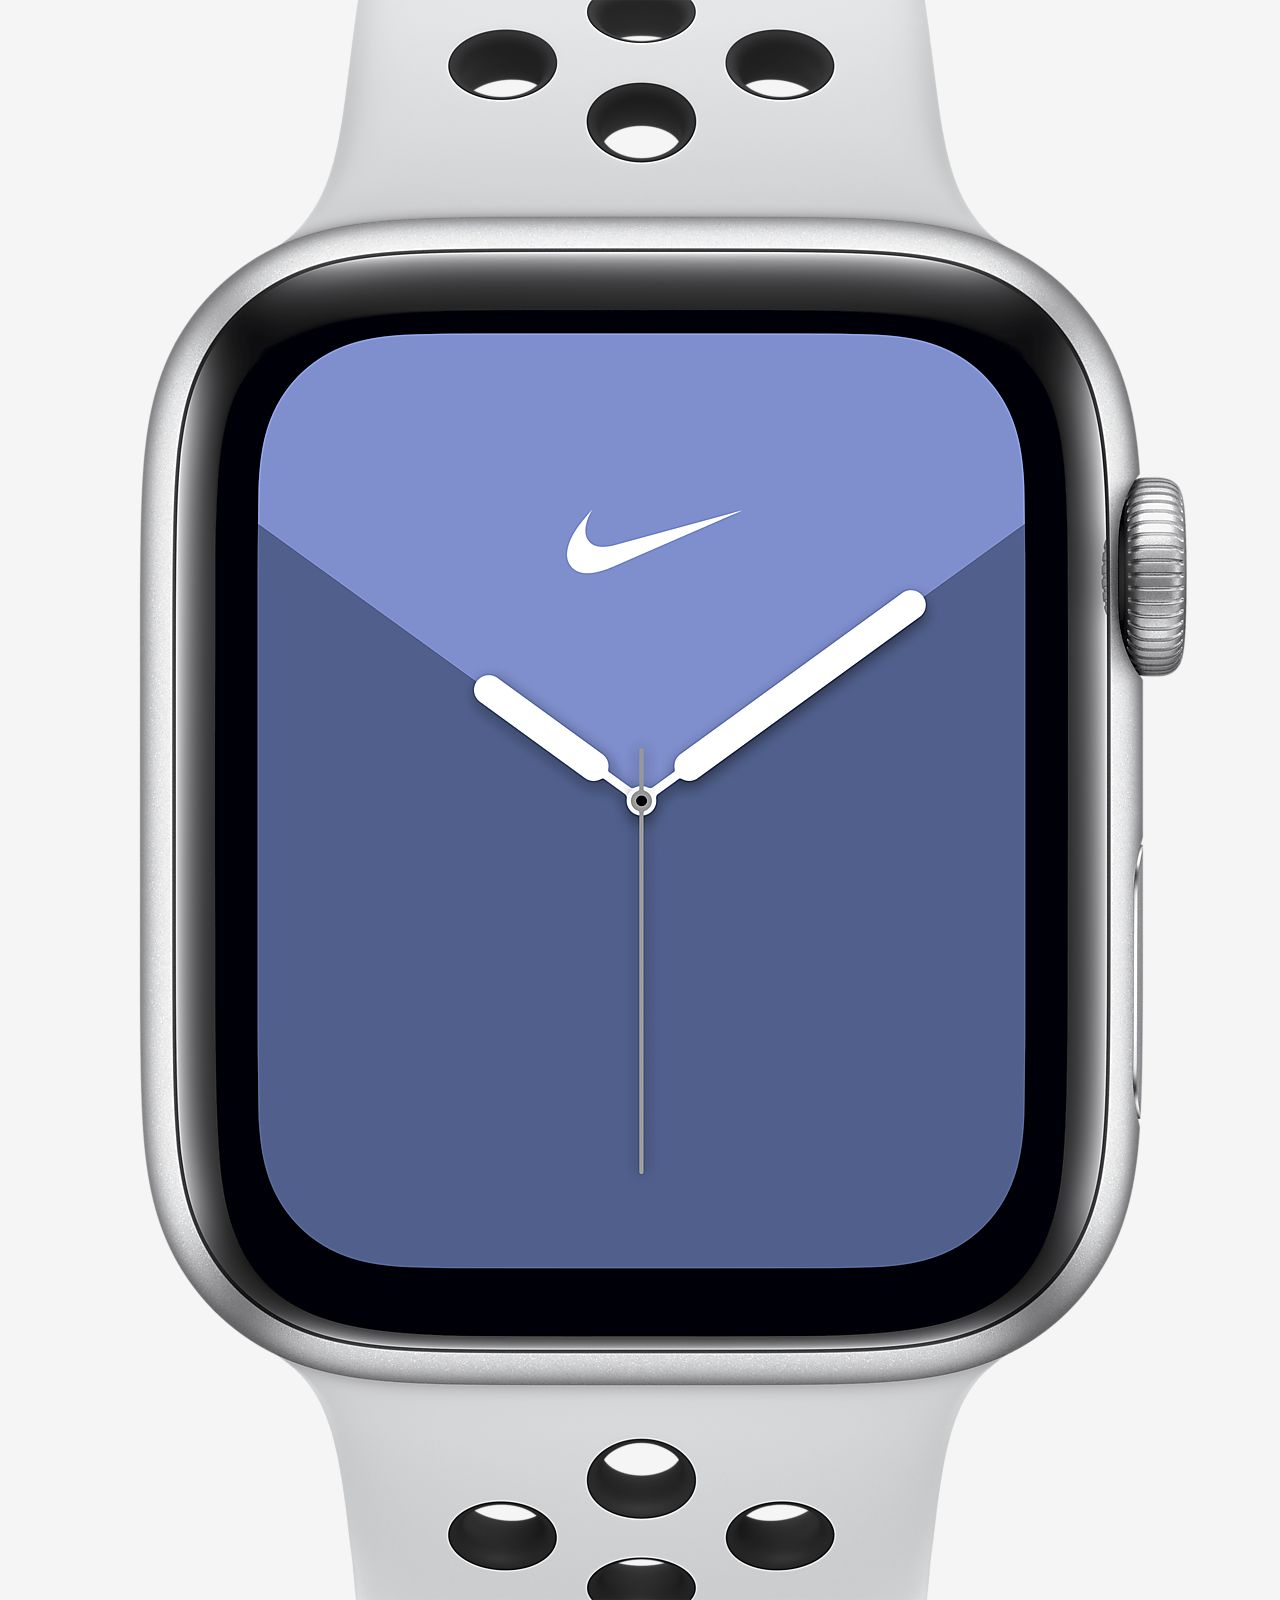 Apple Watch Nike Series 5 (GPS) amb corretja Nike Sport Band i caixa d'alumini platejat de 40 mm